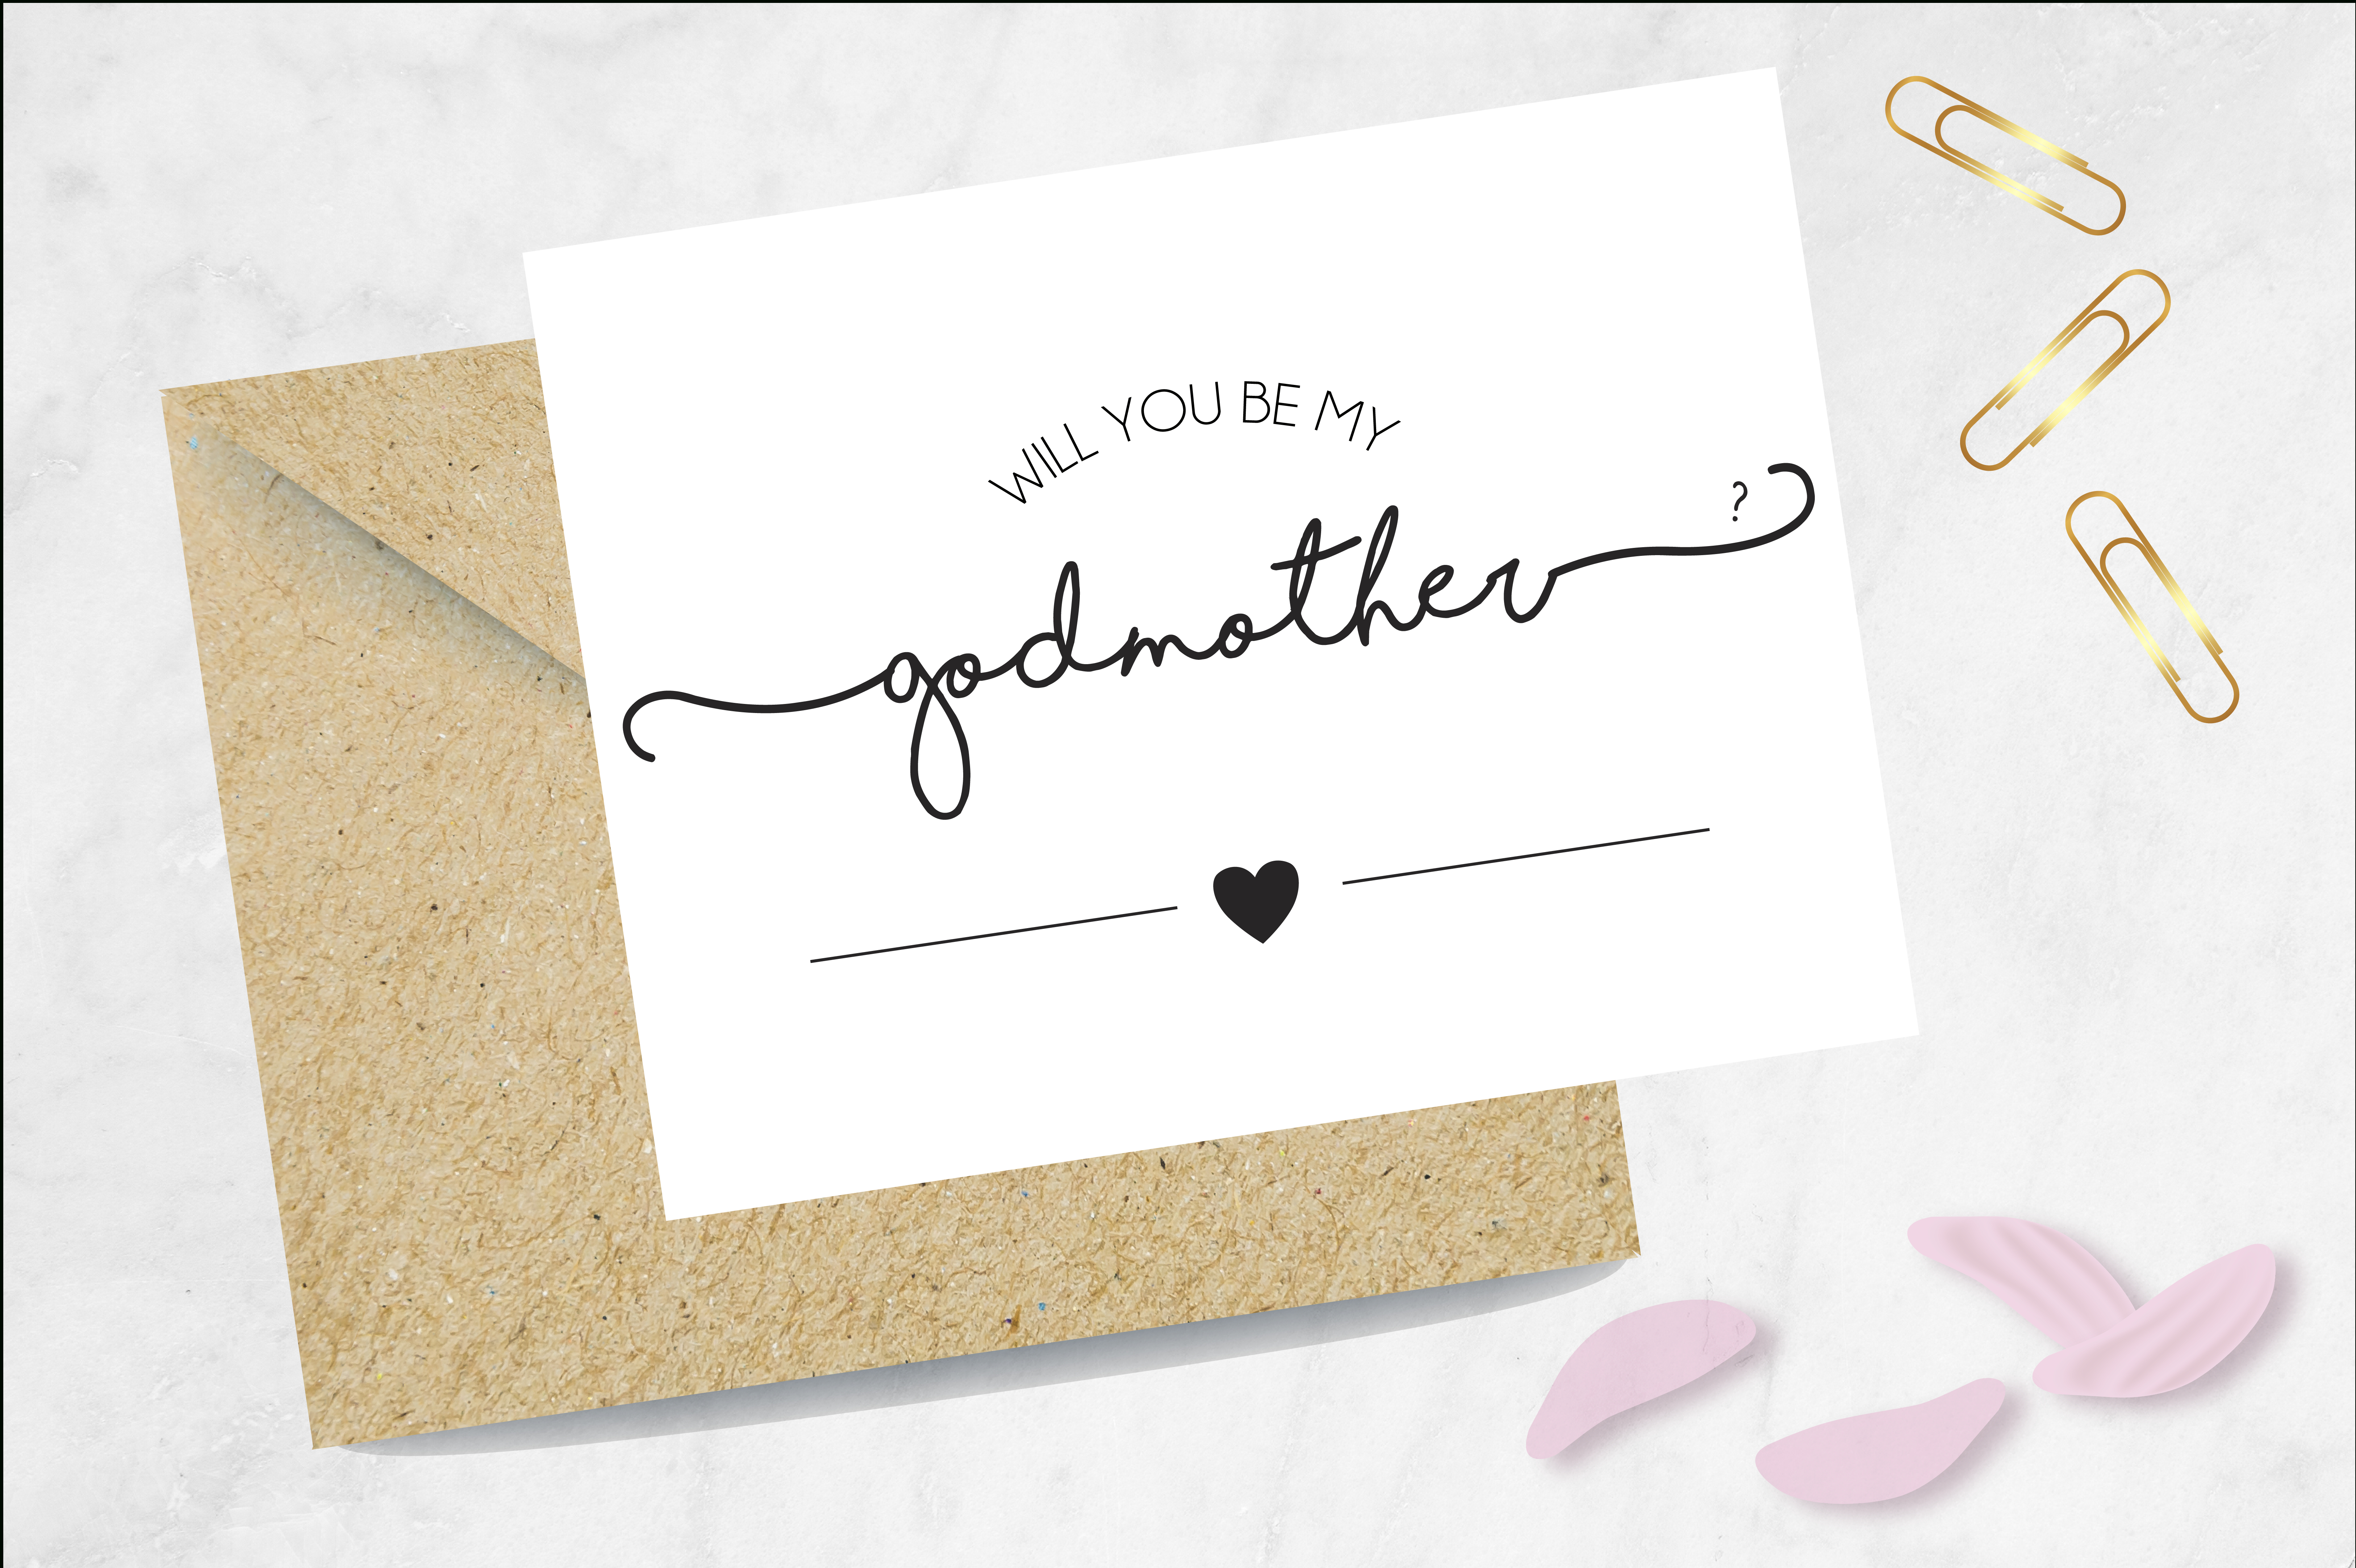 Godmother Proposal Card, Be My Godmother Card, Card For Godmother - Will You Be My Godmother Printable Card Free